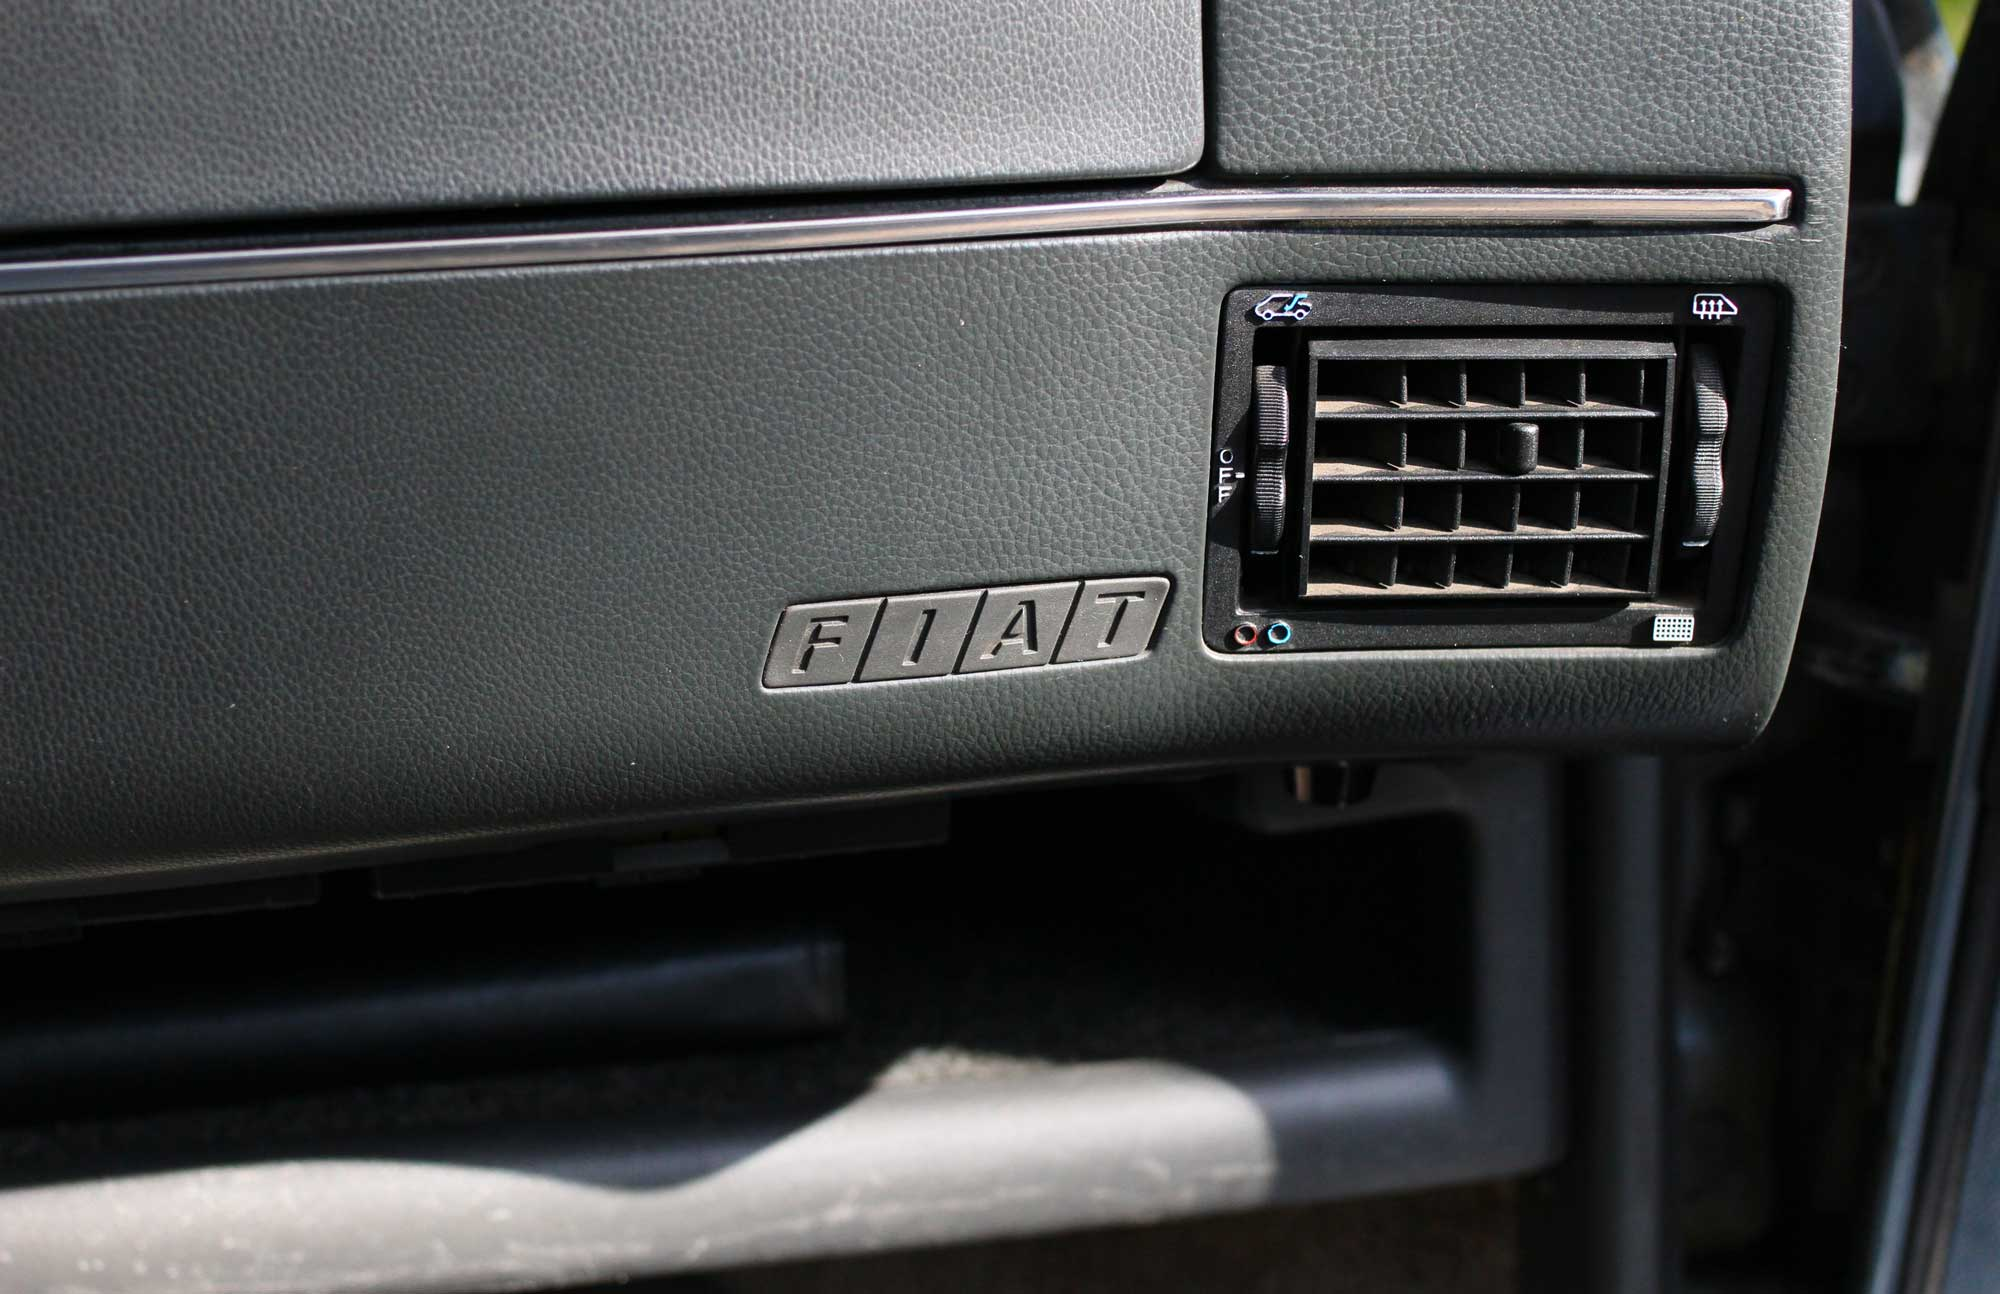 fiat brand inside the car